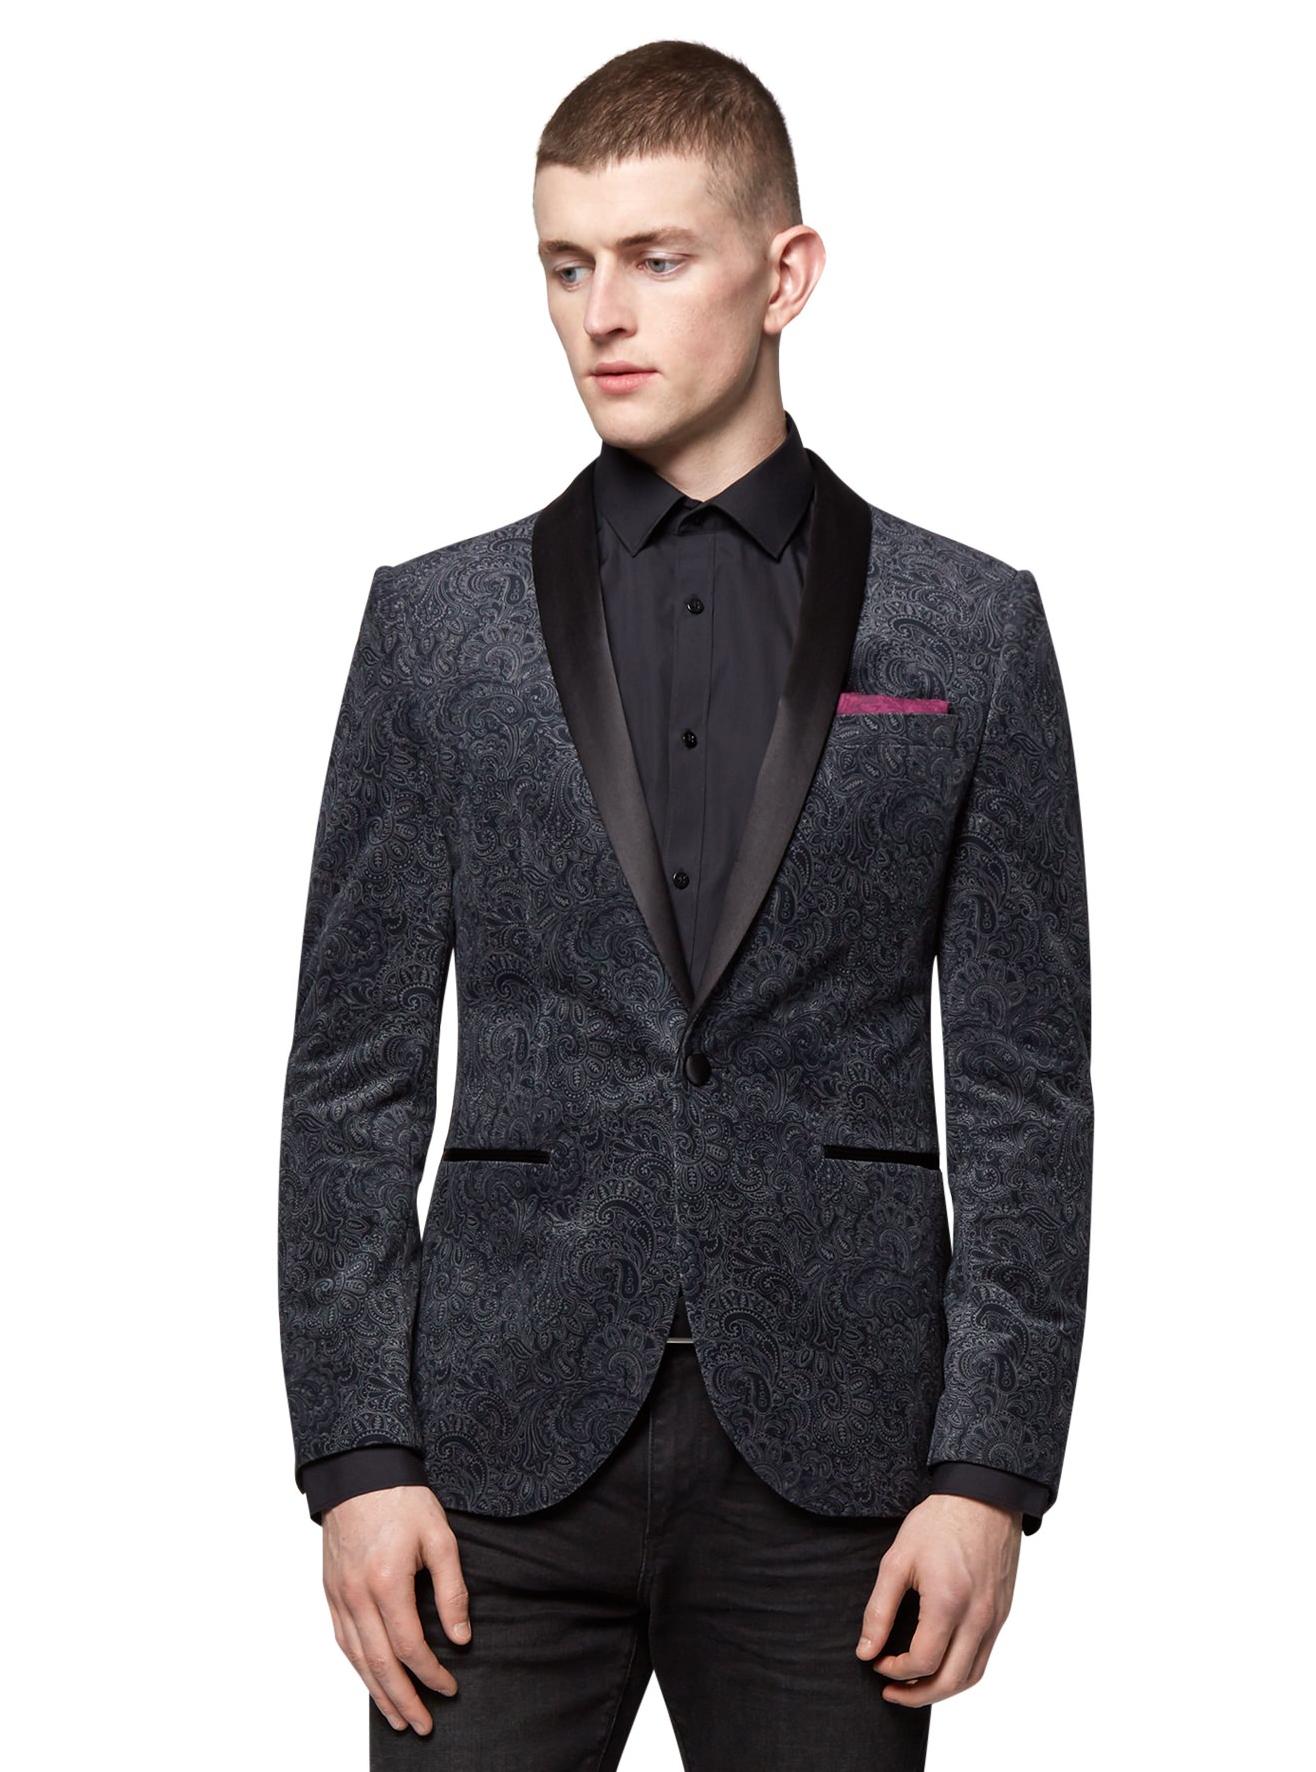 Moss London Mens Grey Suit Jacket Paisley Velvet Blazer Slim Fit ...